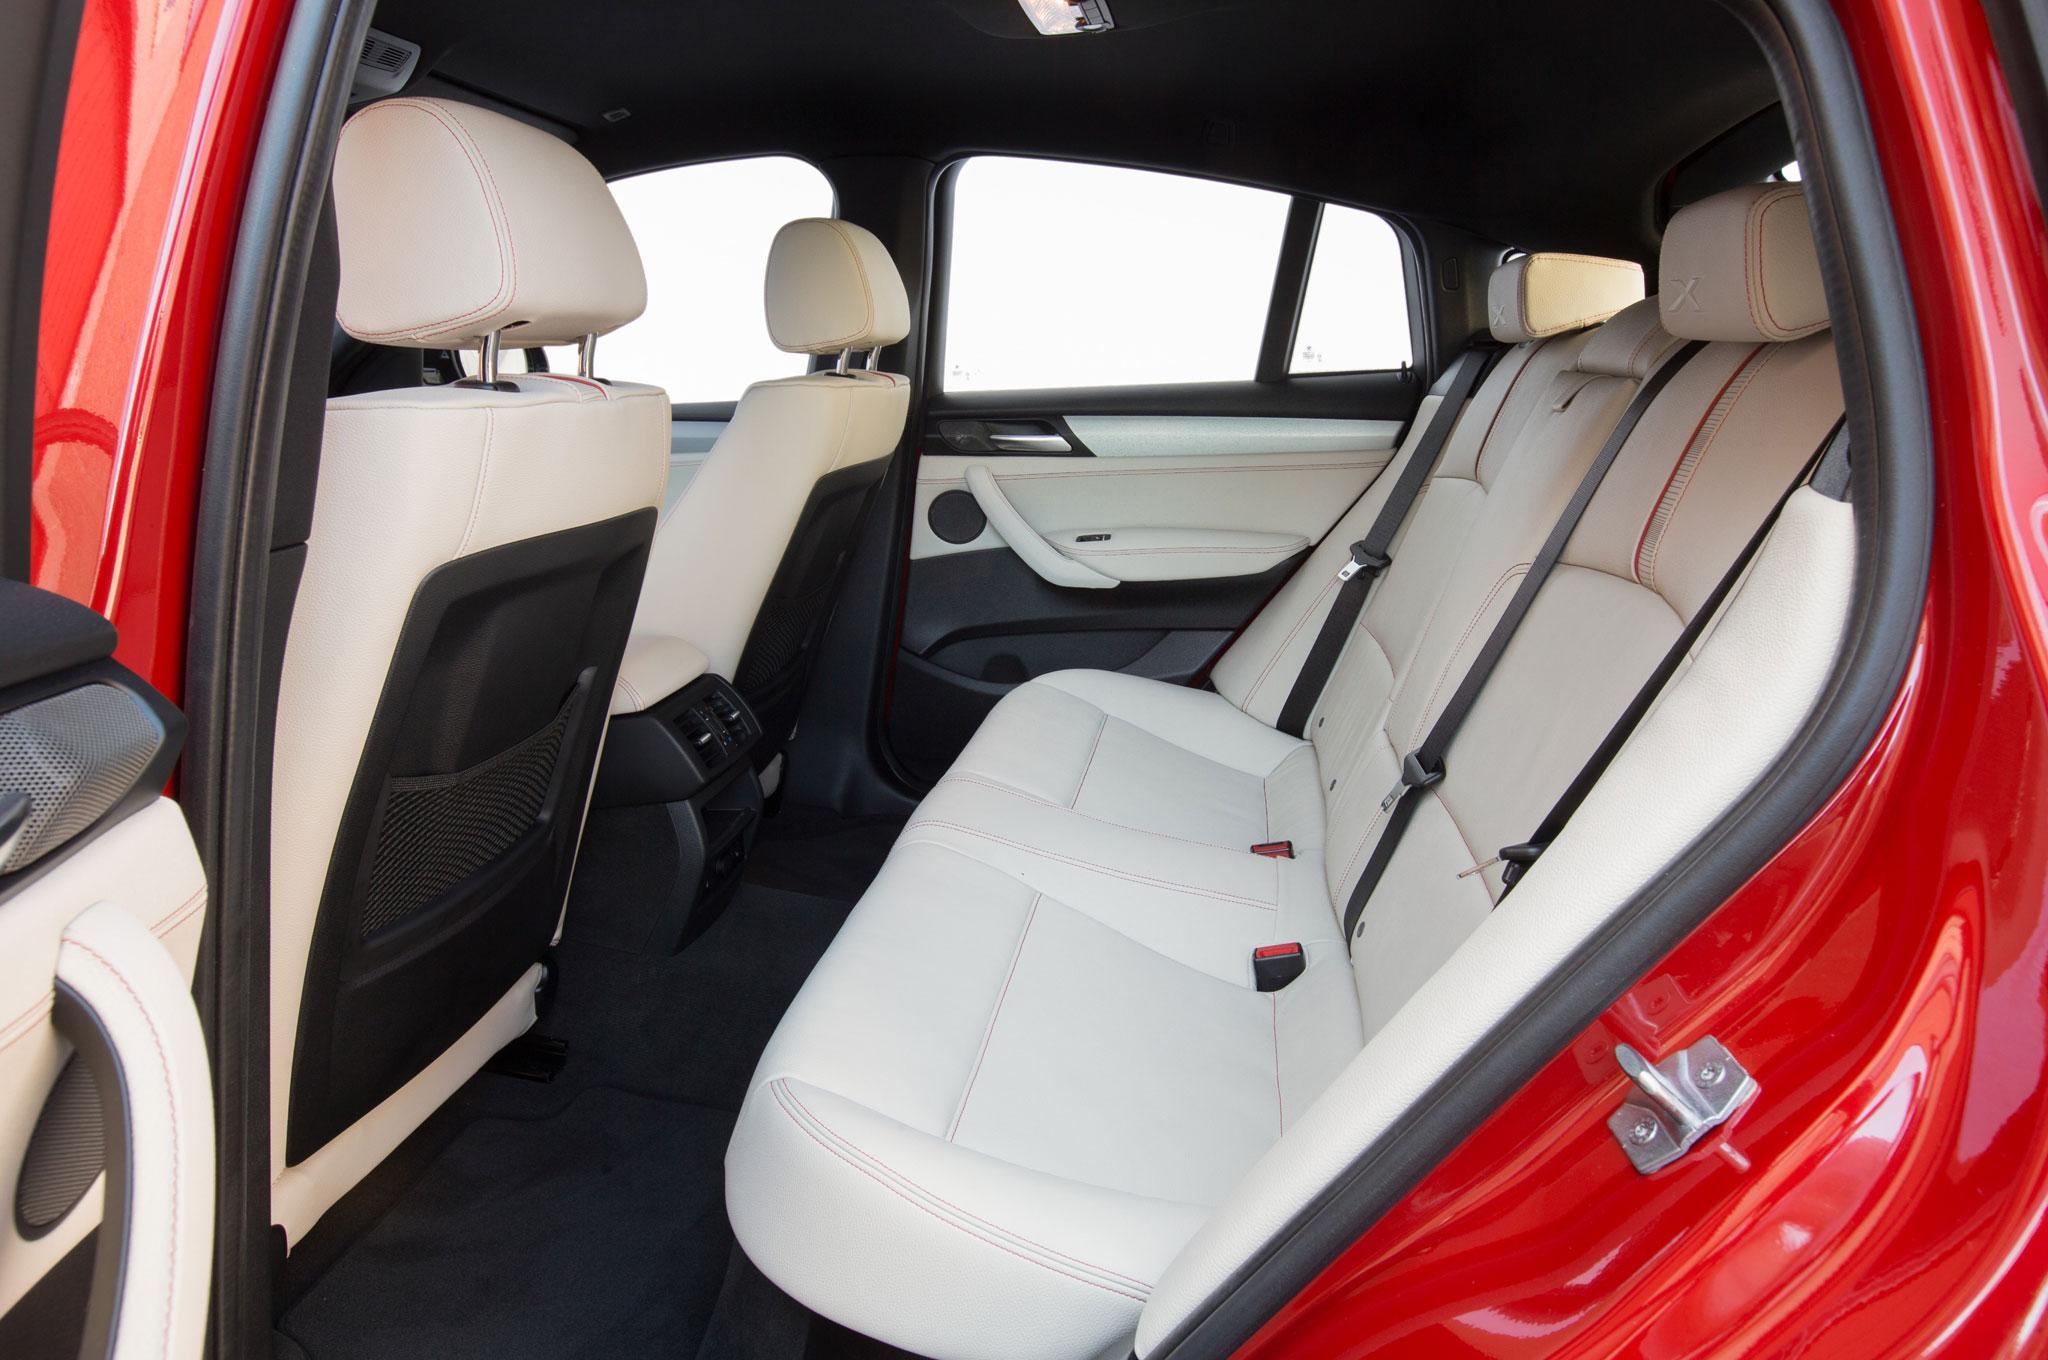 2015 BMW X4 Rear Seat Interior